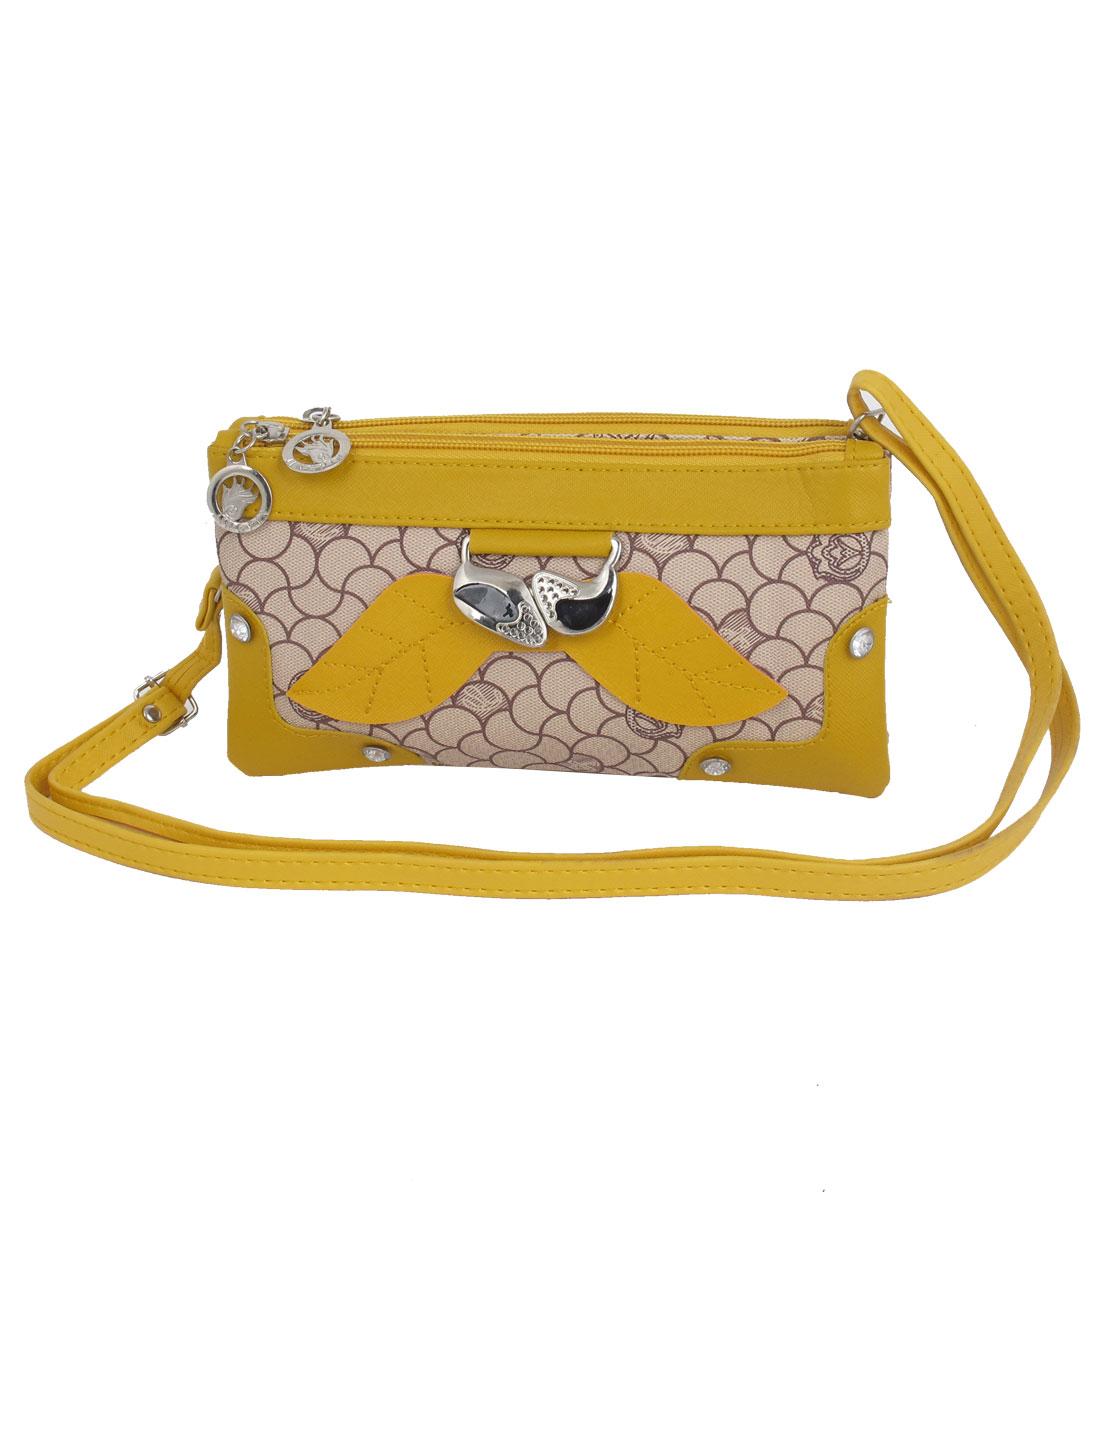 Lady Faux Leather Double Zipper Shoulder Messenger Bag Handbag Yellow Gray